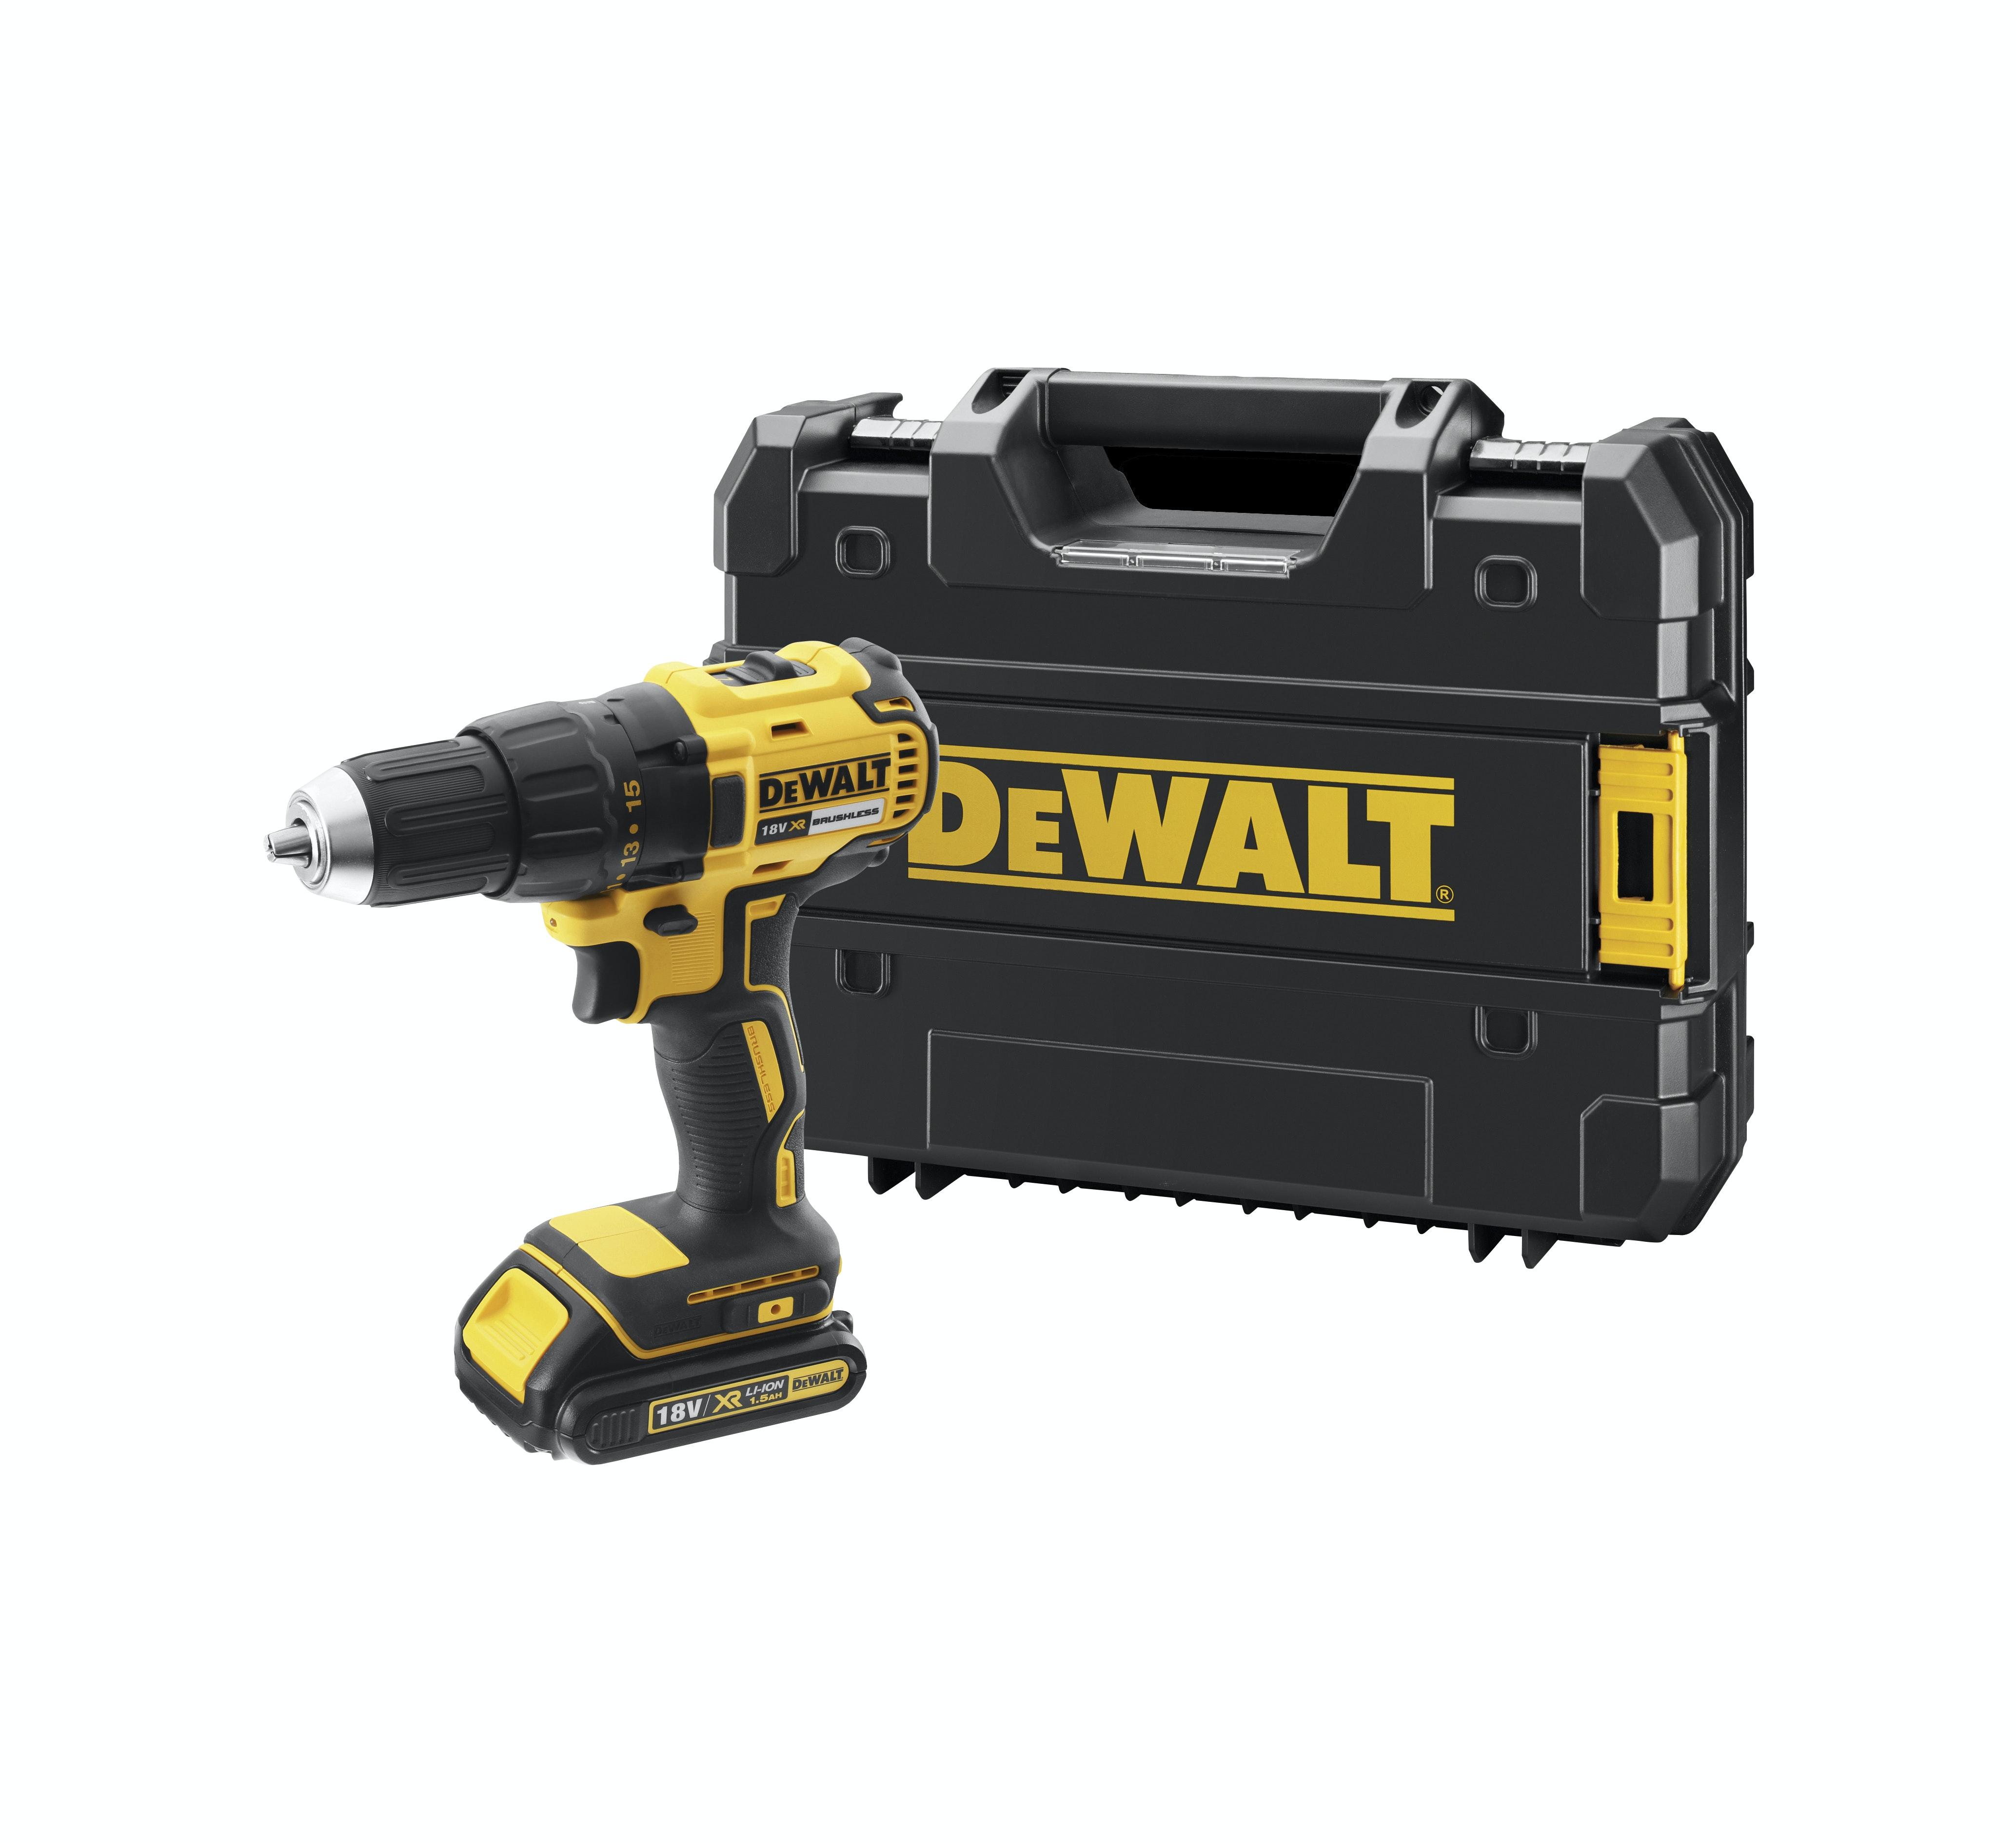 Borrskruvdragare Dewalt DCD777S2T-QW 18V